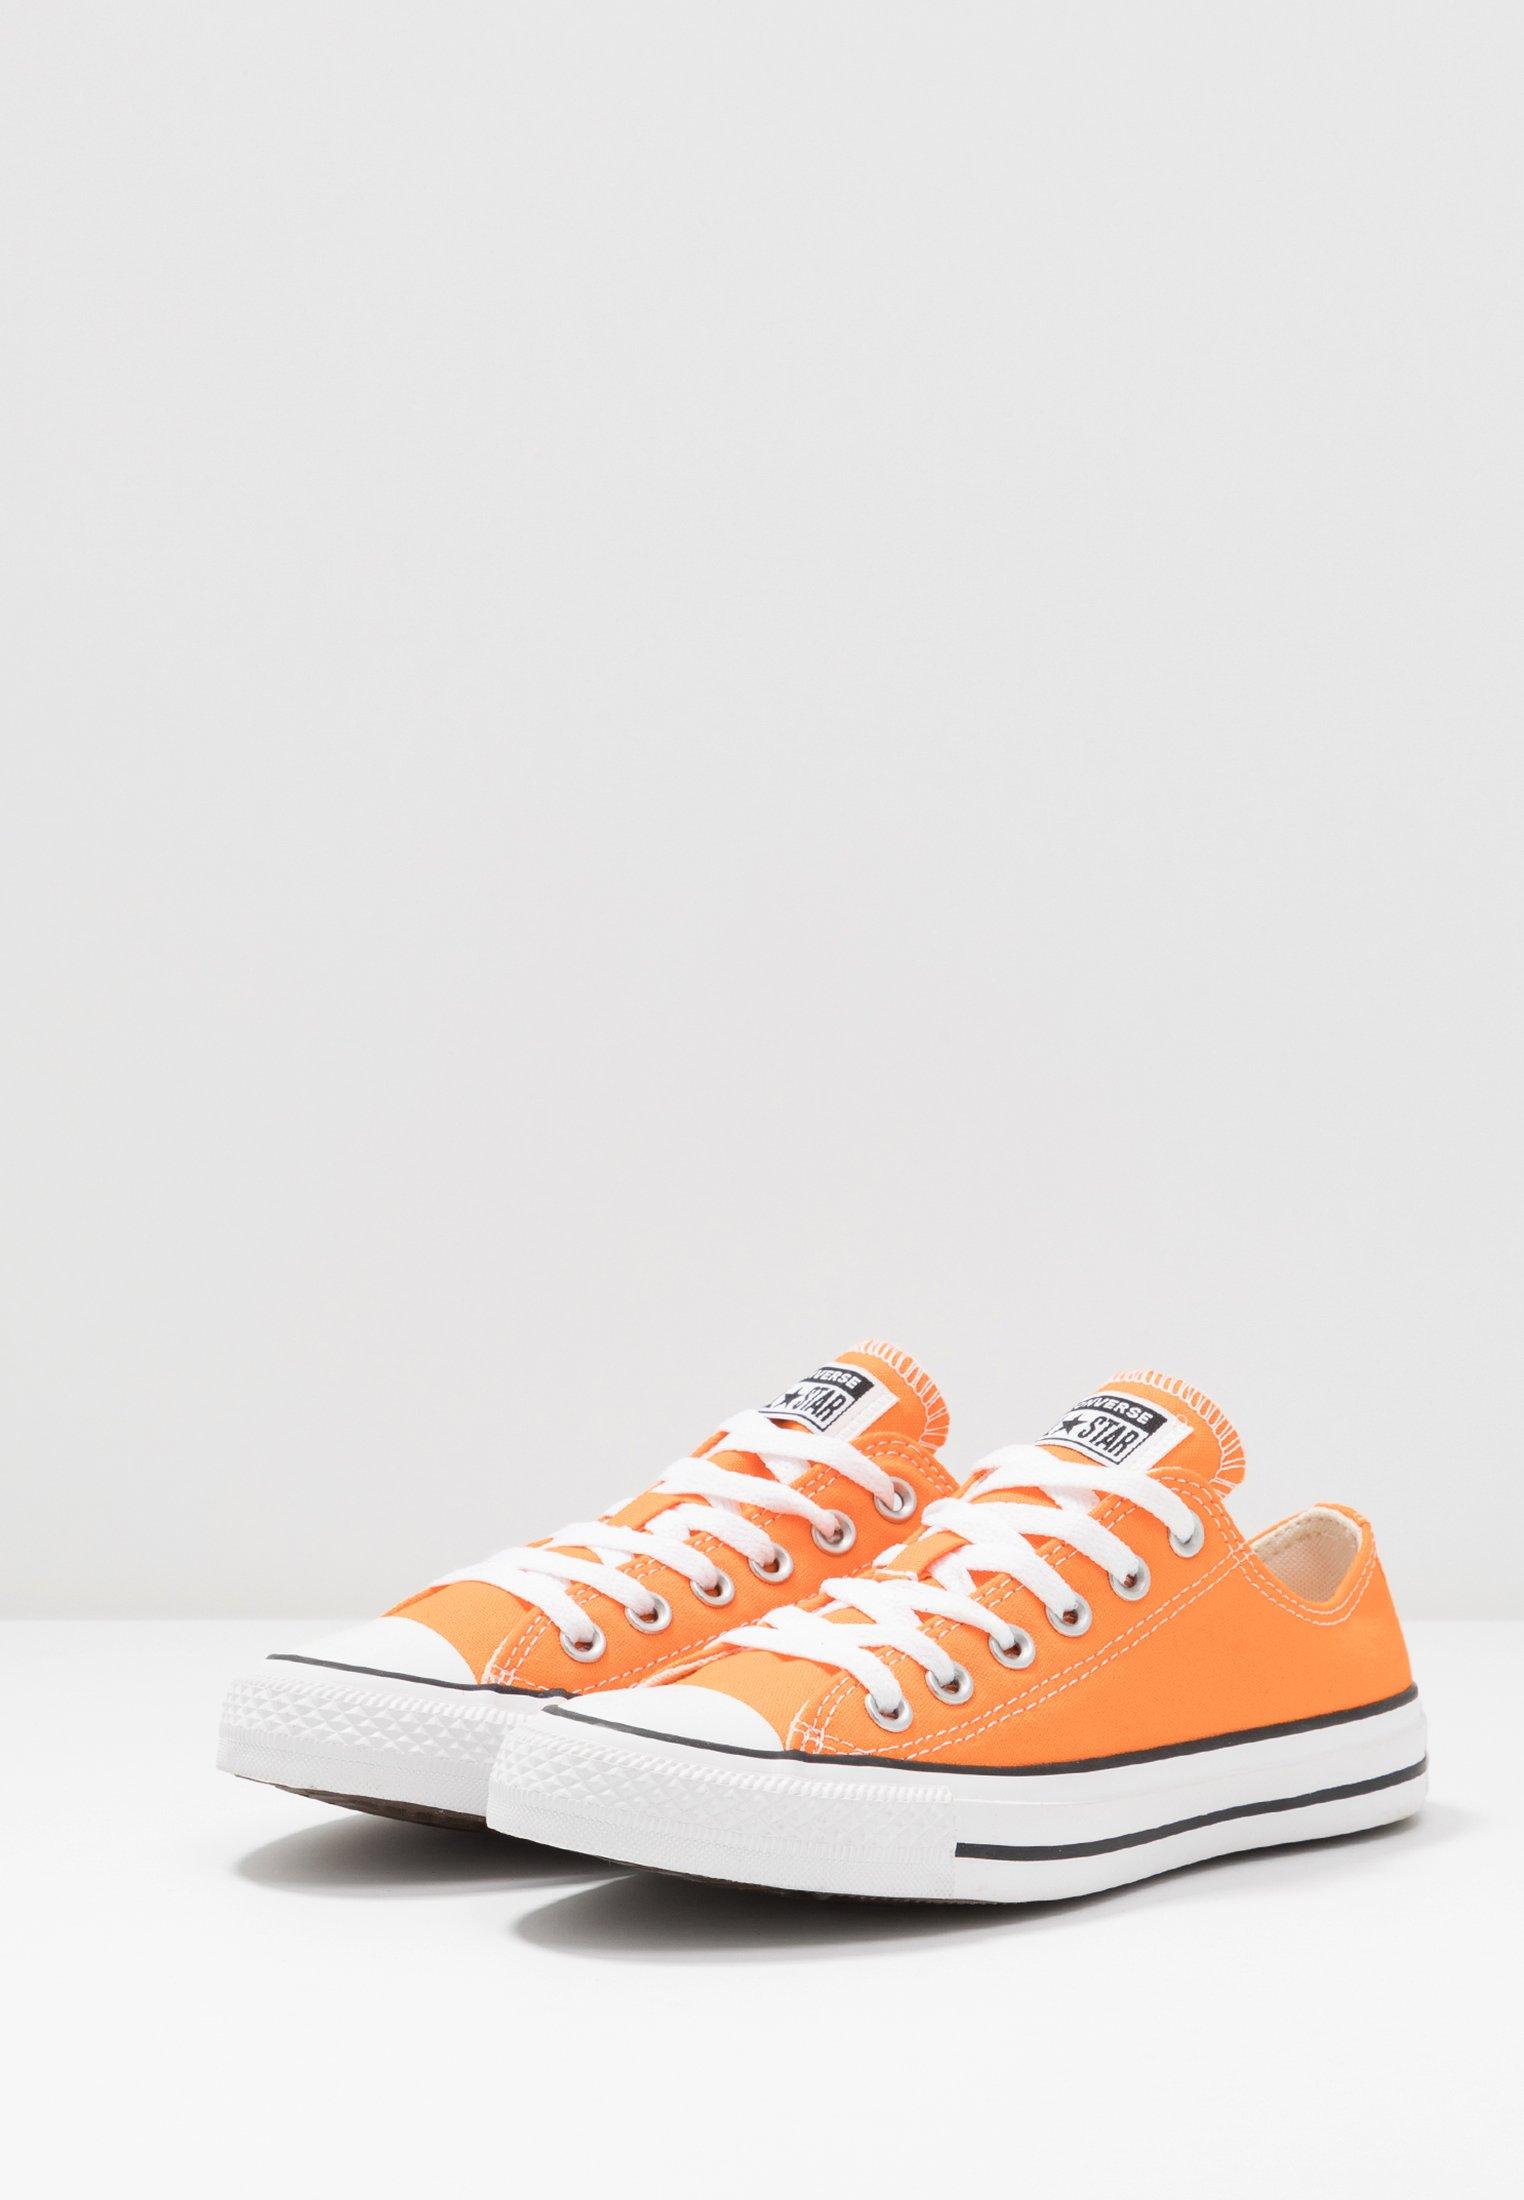 Herren CHUCK TAYLOR ALL STAR SEASONAL COLOR - Sneaker low